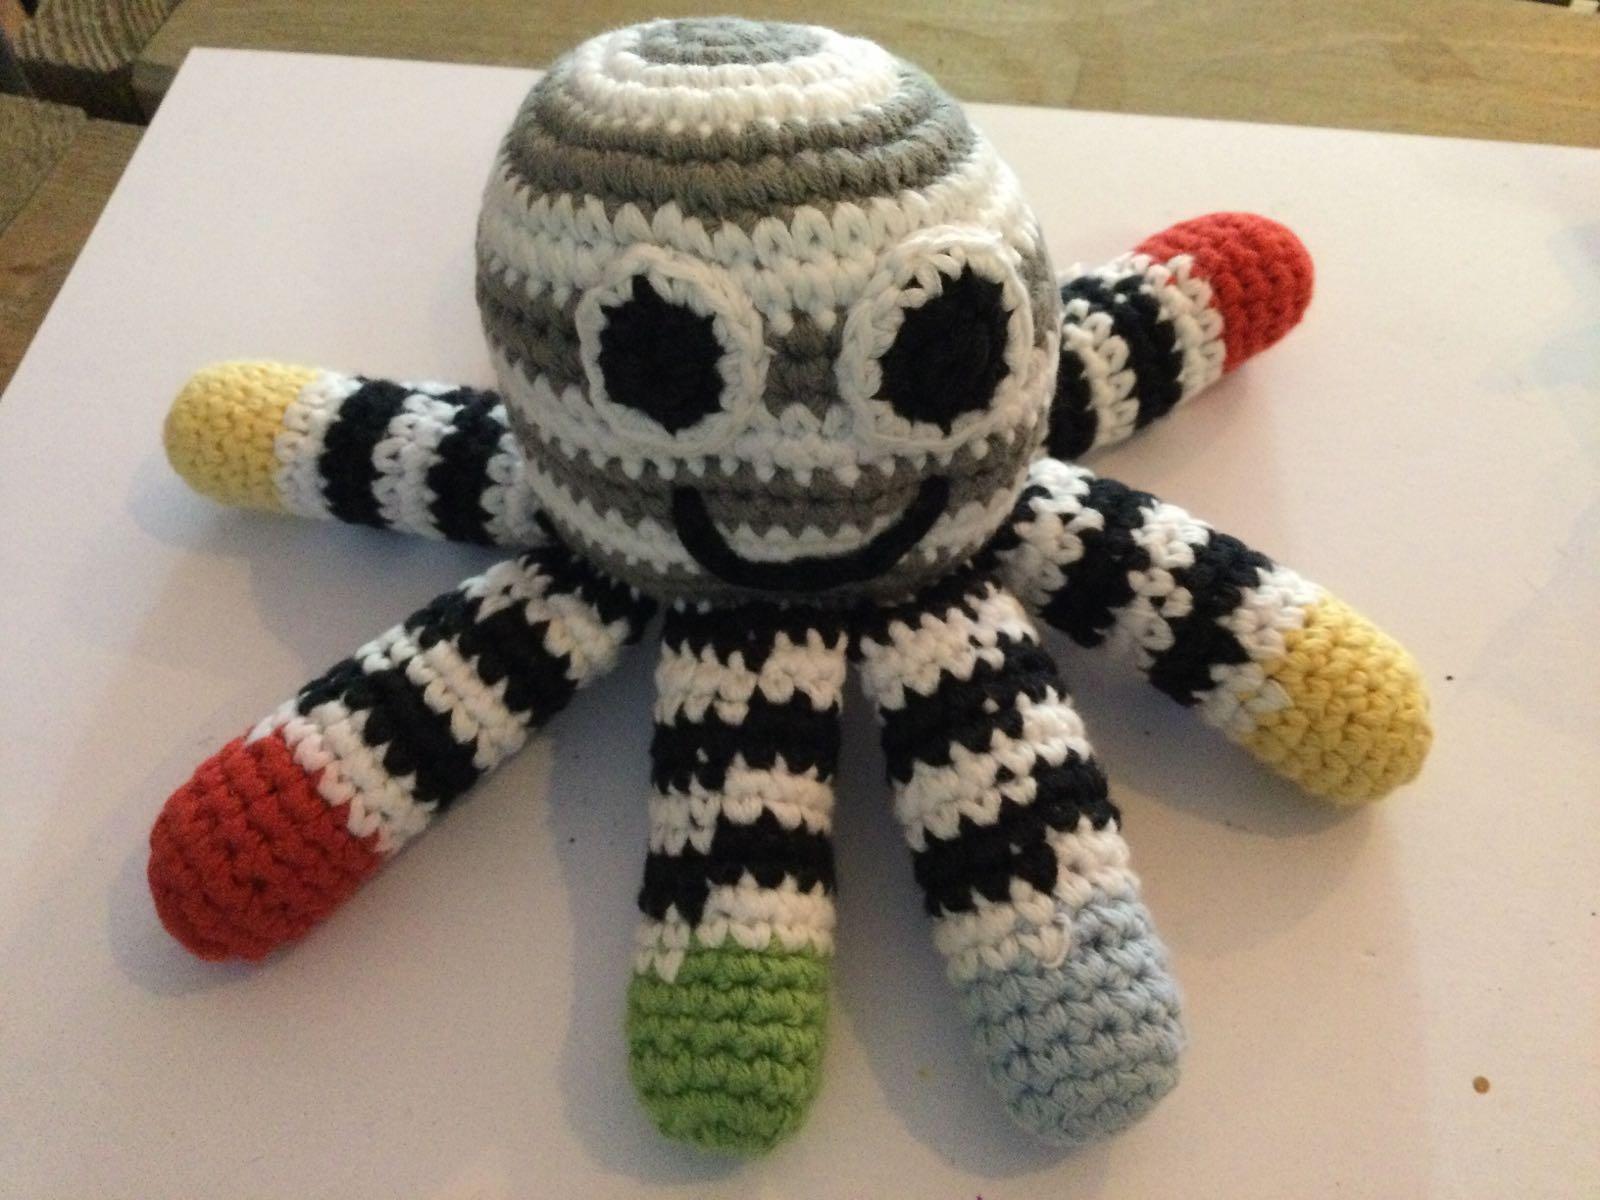 Pebble - Crochet Octopus Rattle Black / White